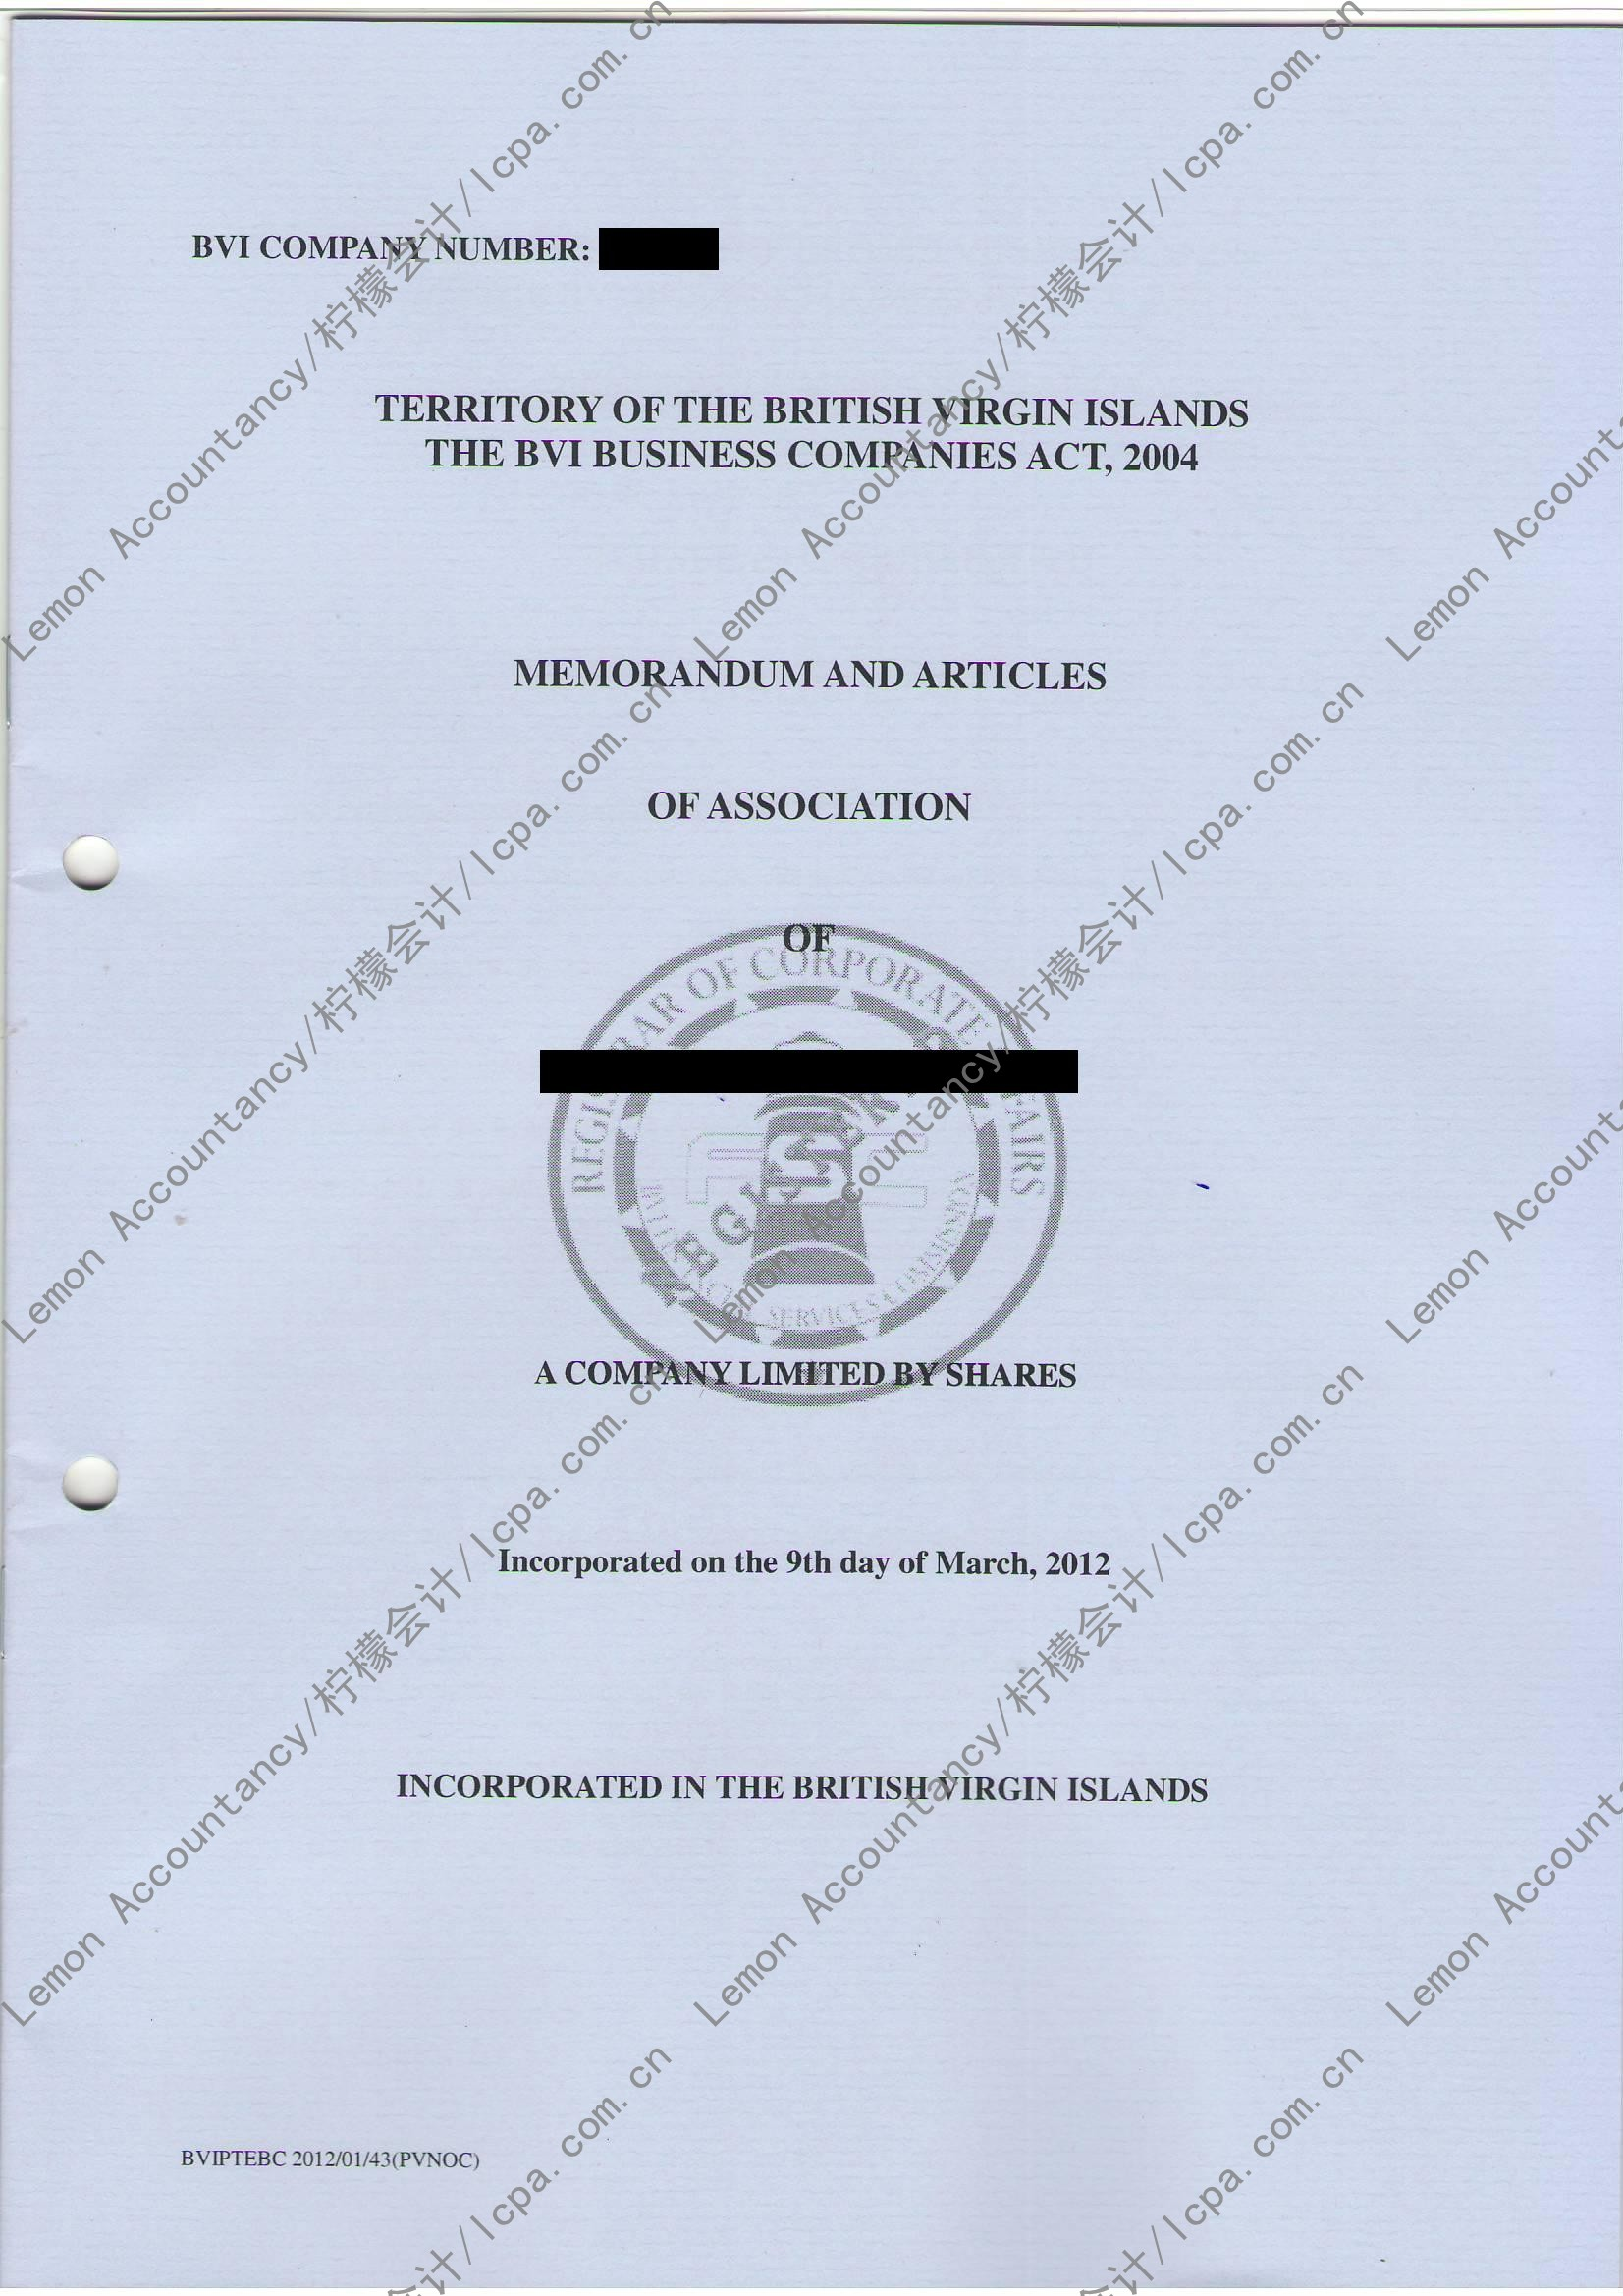 memorandum and articles of association 中文 版